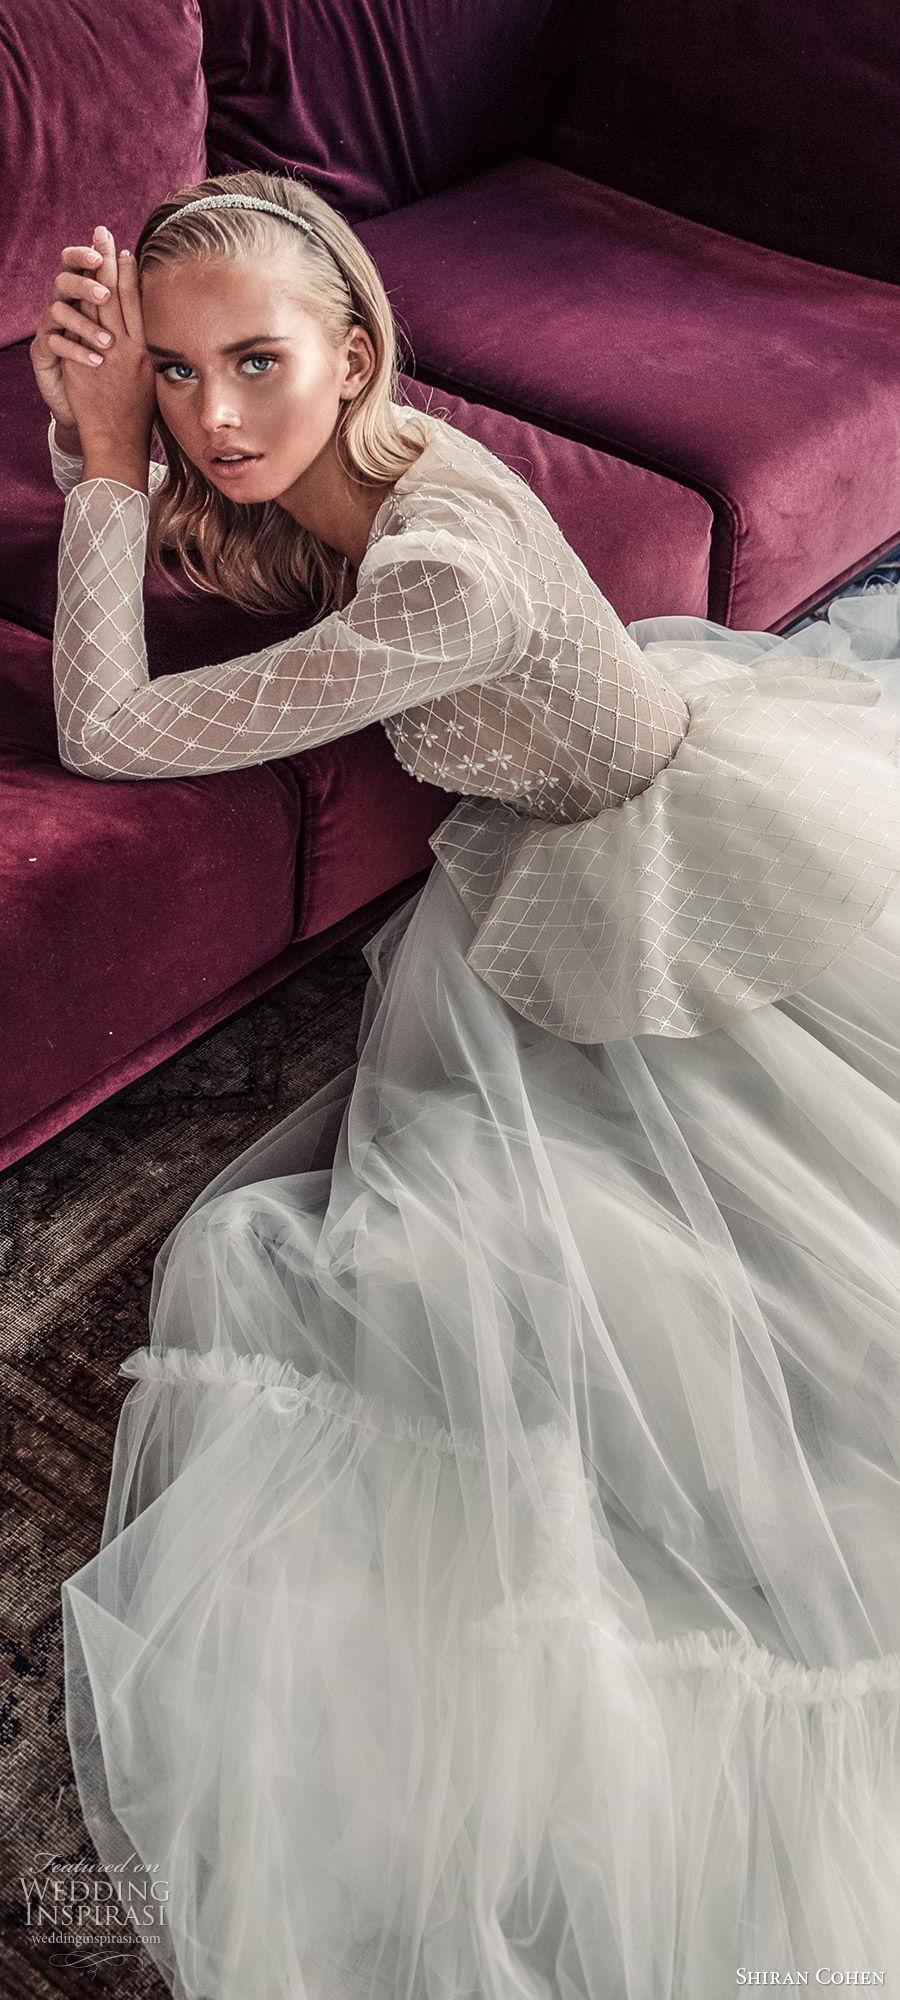 shiran cohen 2019 bridal illusion long sleeves plunging v neckline embellished bodice peplum a line wedding dress ruffle skirt romantic  (10) zsdv